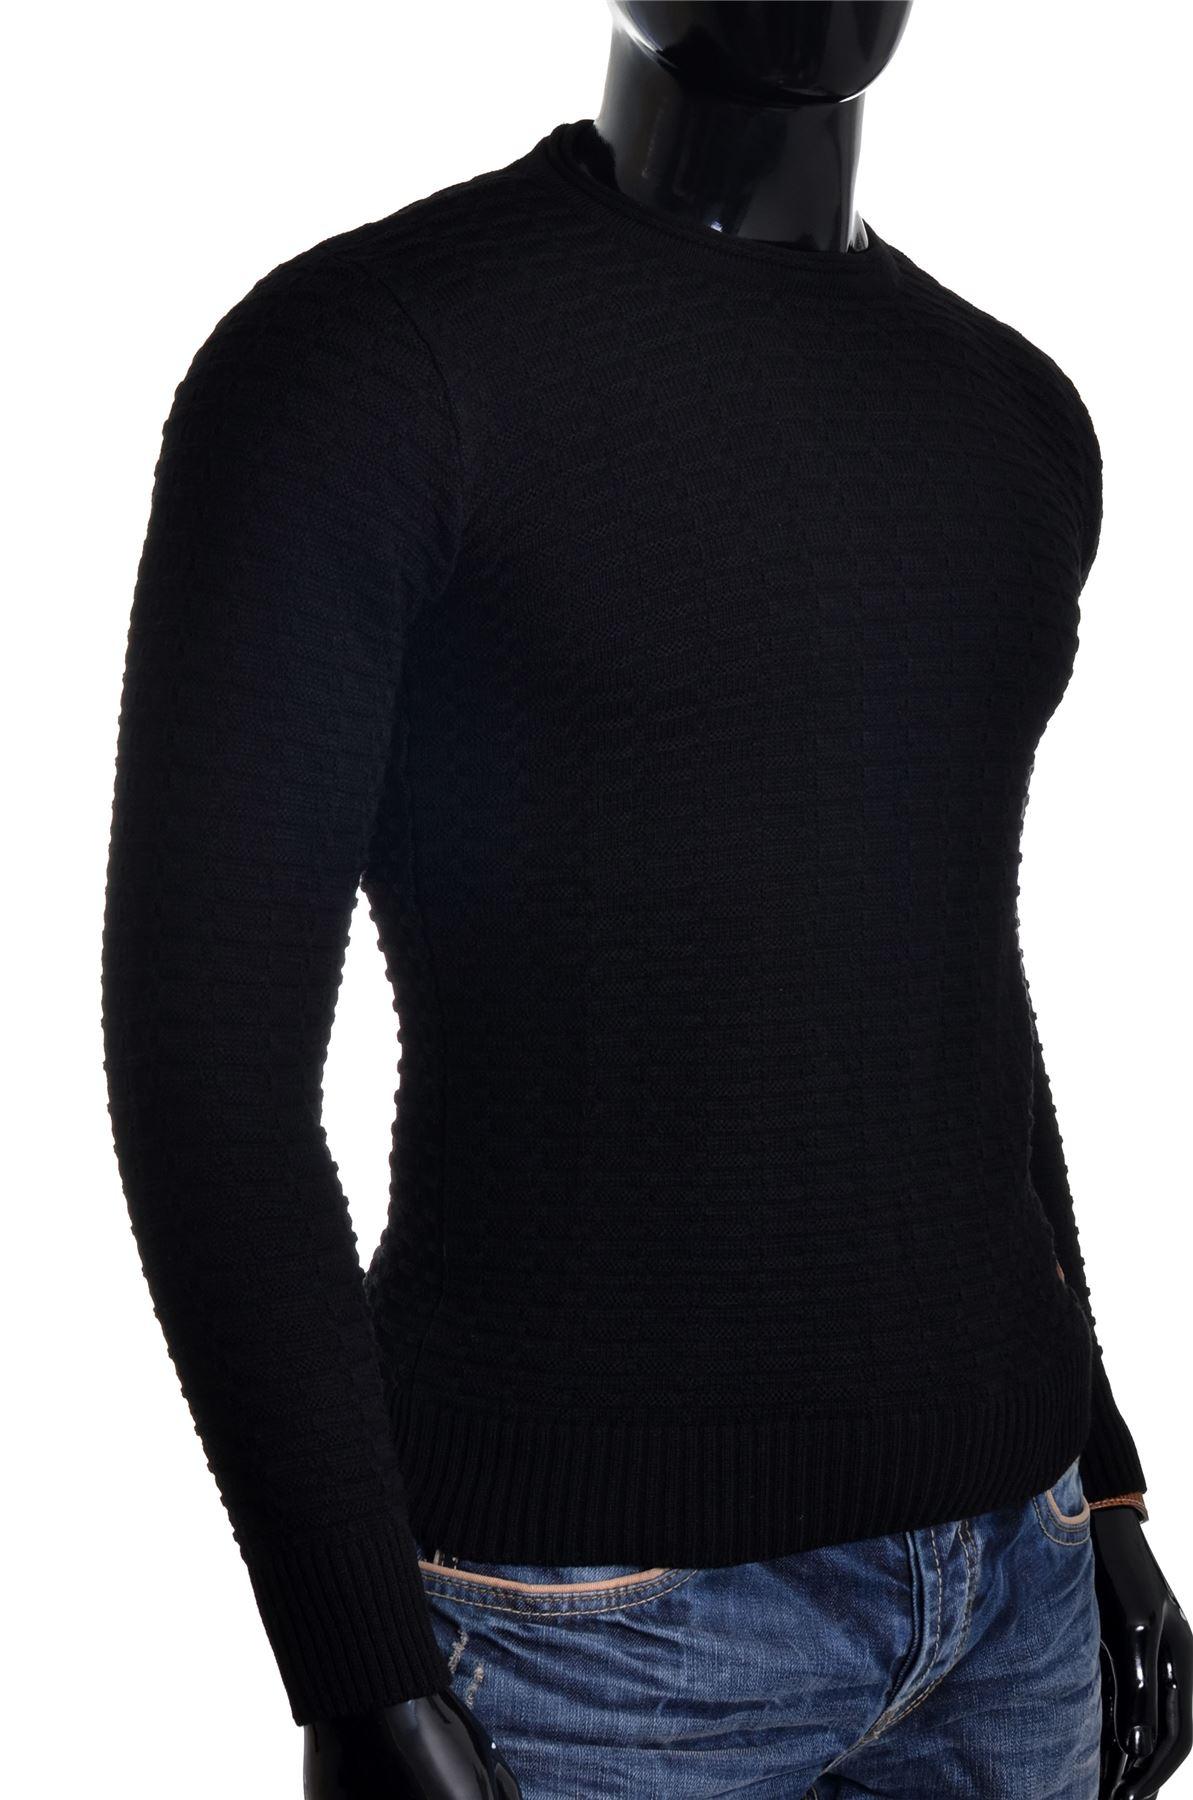 Men-039-s-Jumper-Striped-Knit-Smart-Long-Sleeve-Sweater-Crew-Neck-Top-Slim-Fitness thumbnail 9